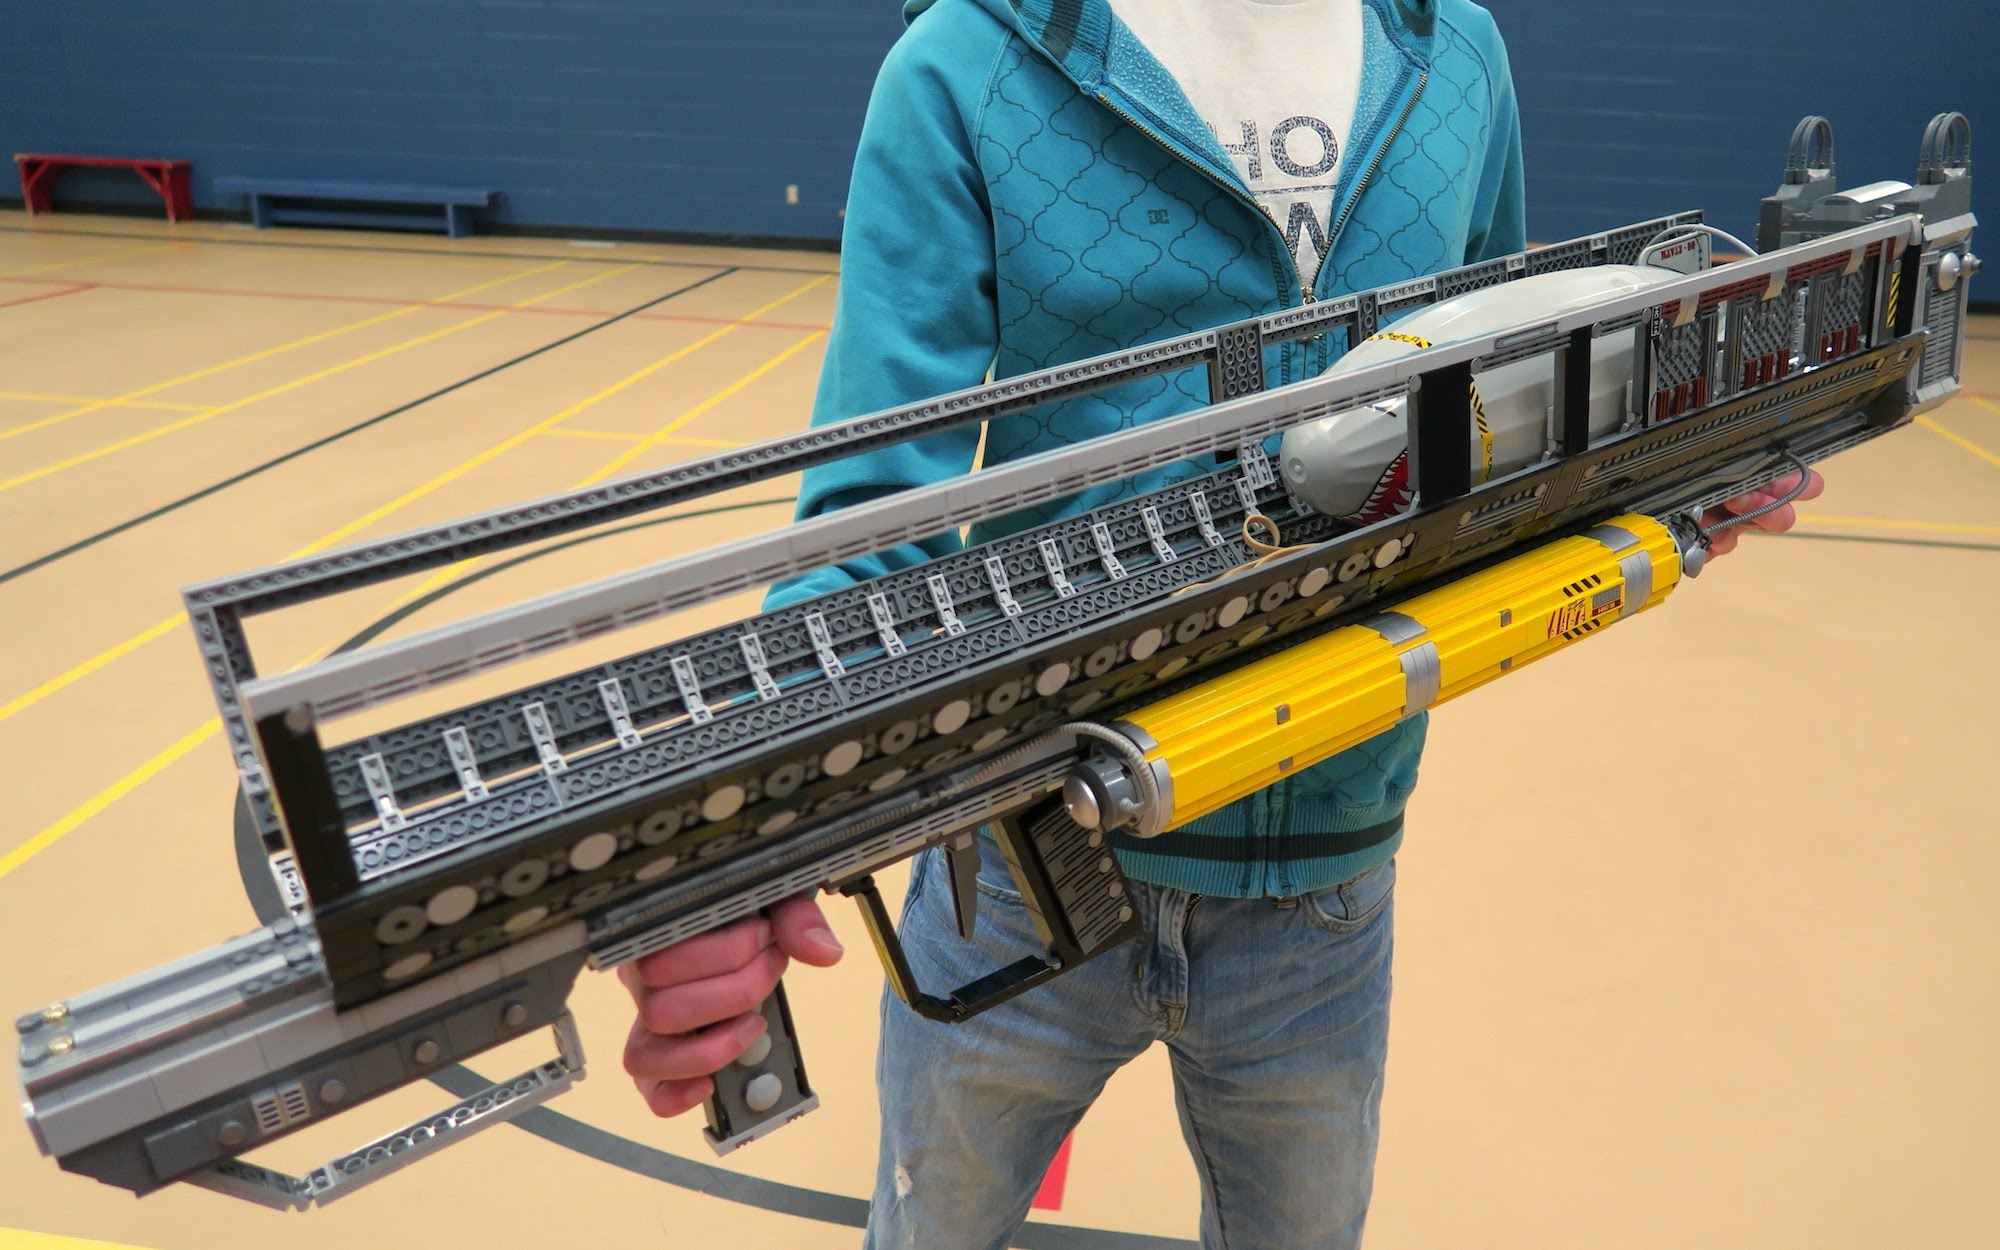 LEGO Blasters In A Nerf Battle No Thanks Blaster Hub